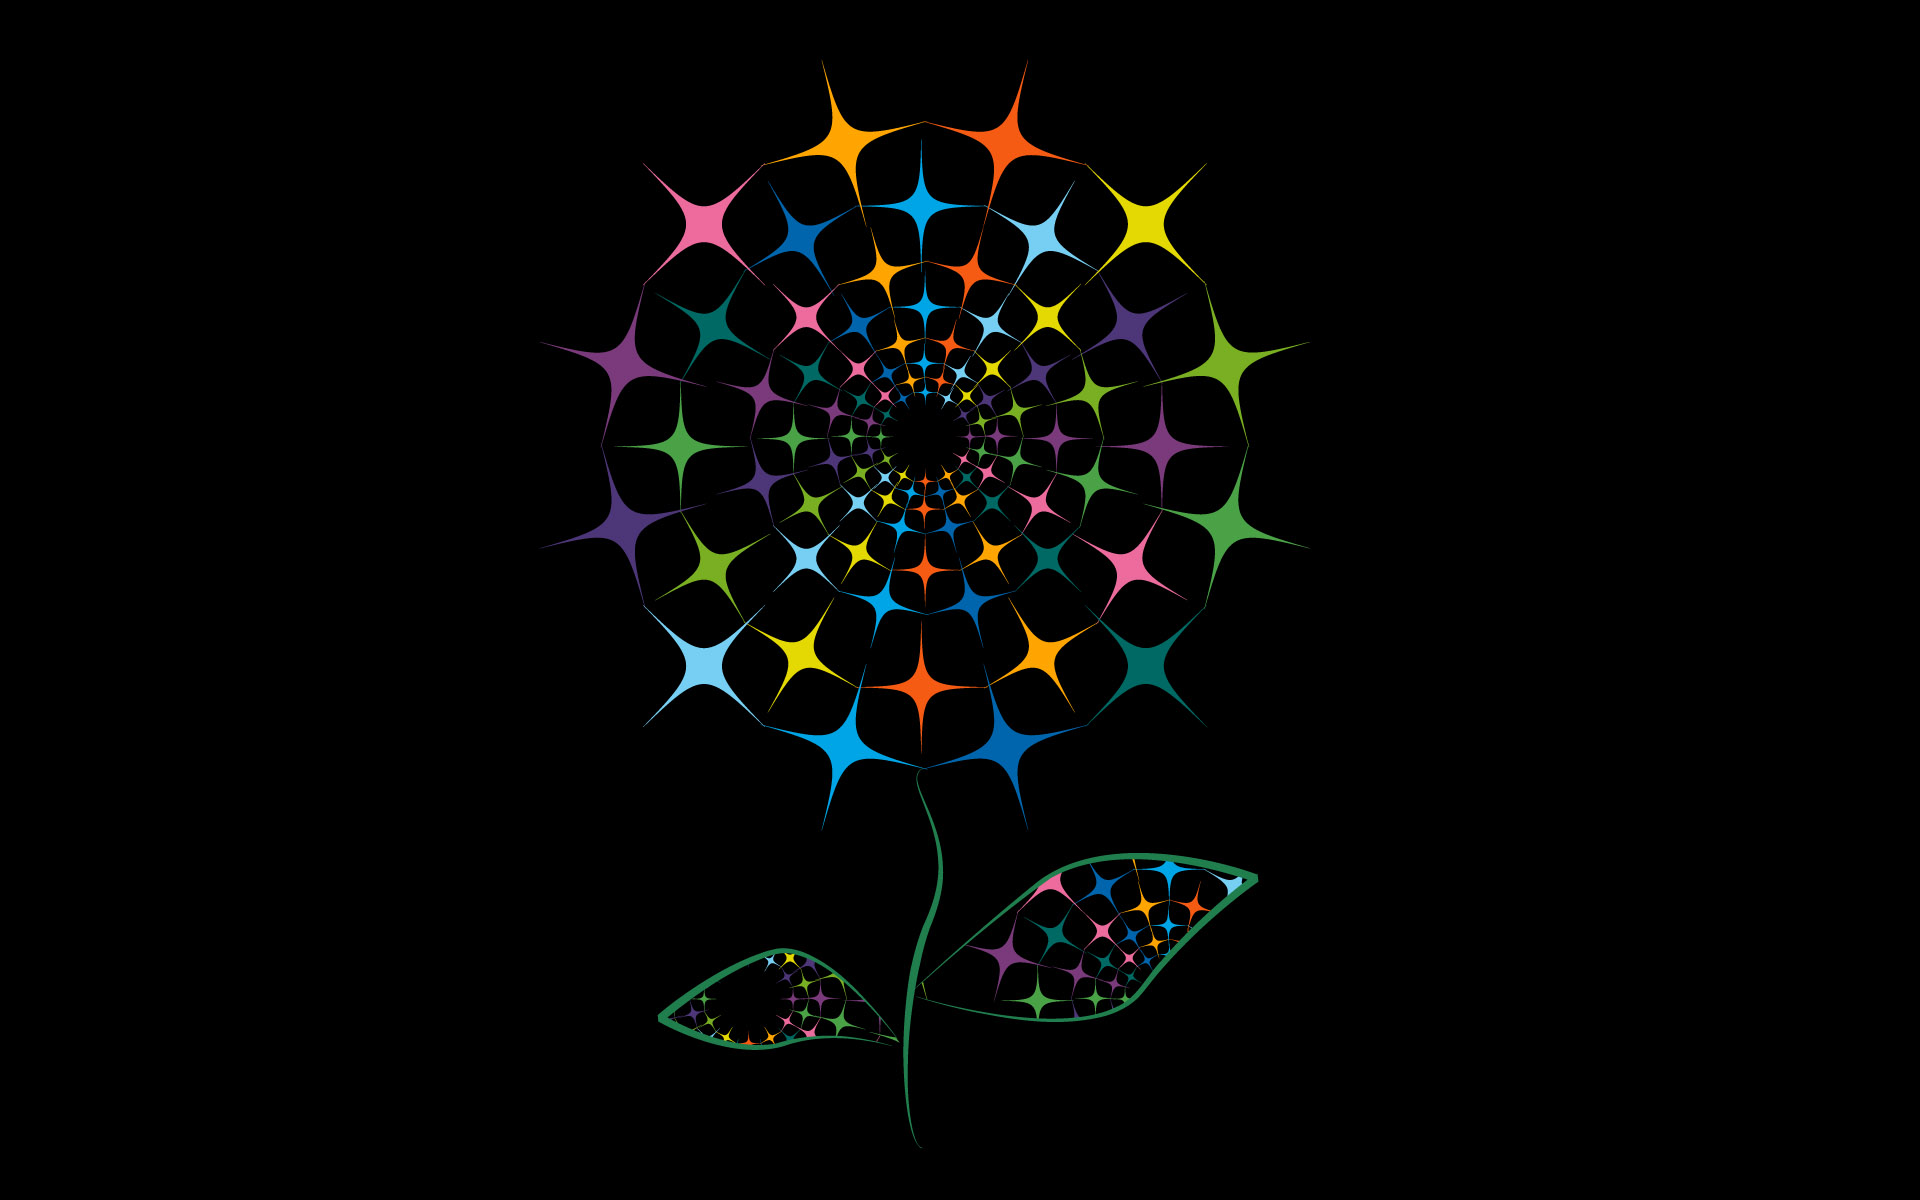 Black Flower Wallpaper 17 Desktop Background